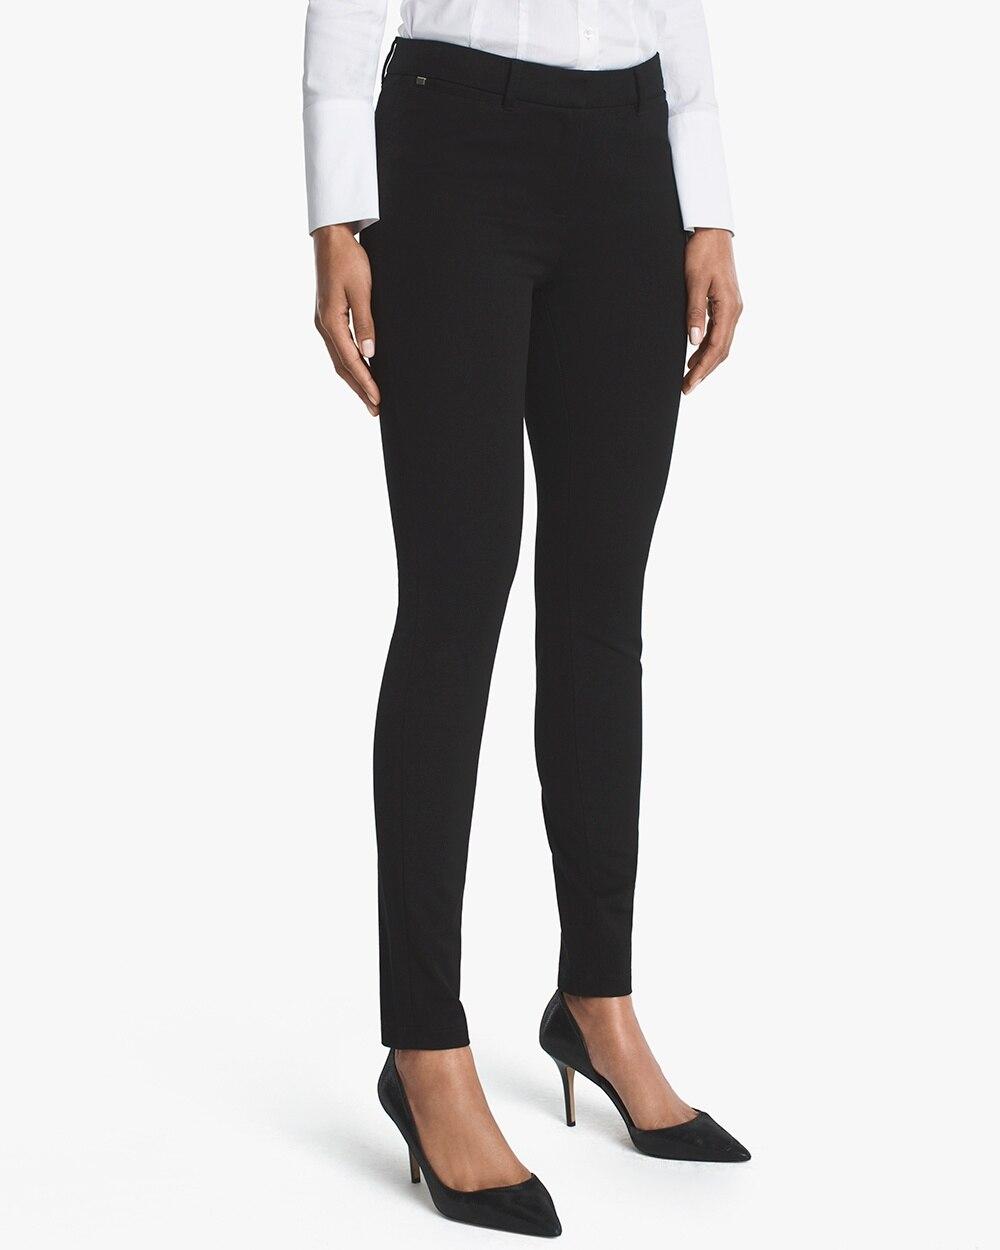 Skinny Ankle Pants White House Black Market